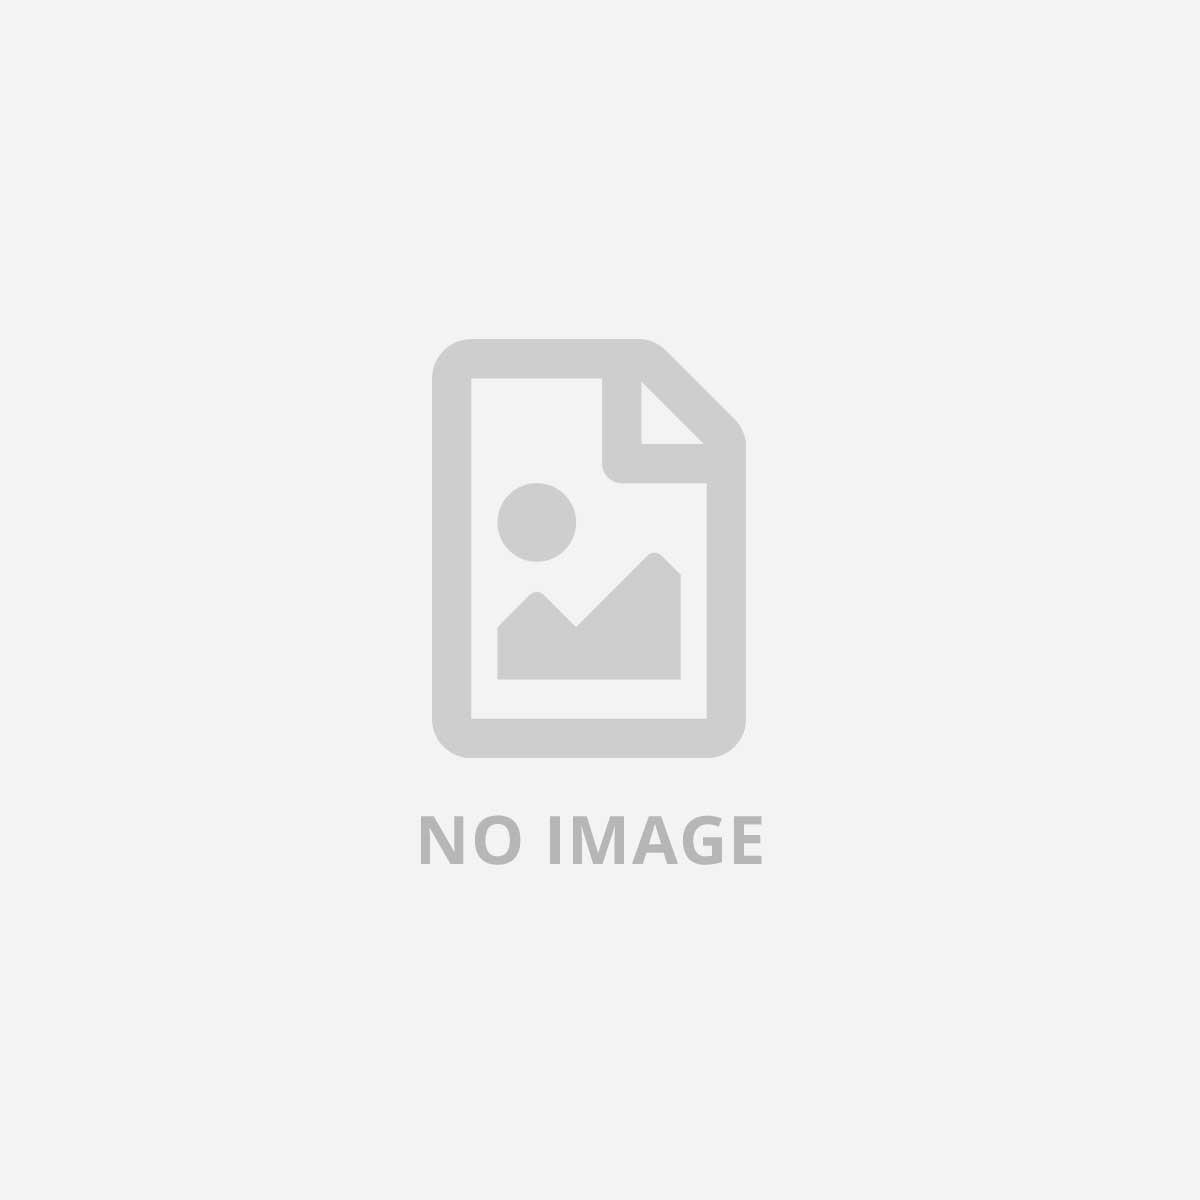 KENWOOD DASHCAM DRV-A201 TFT LCD FULL HD2.7